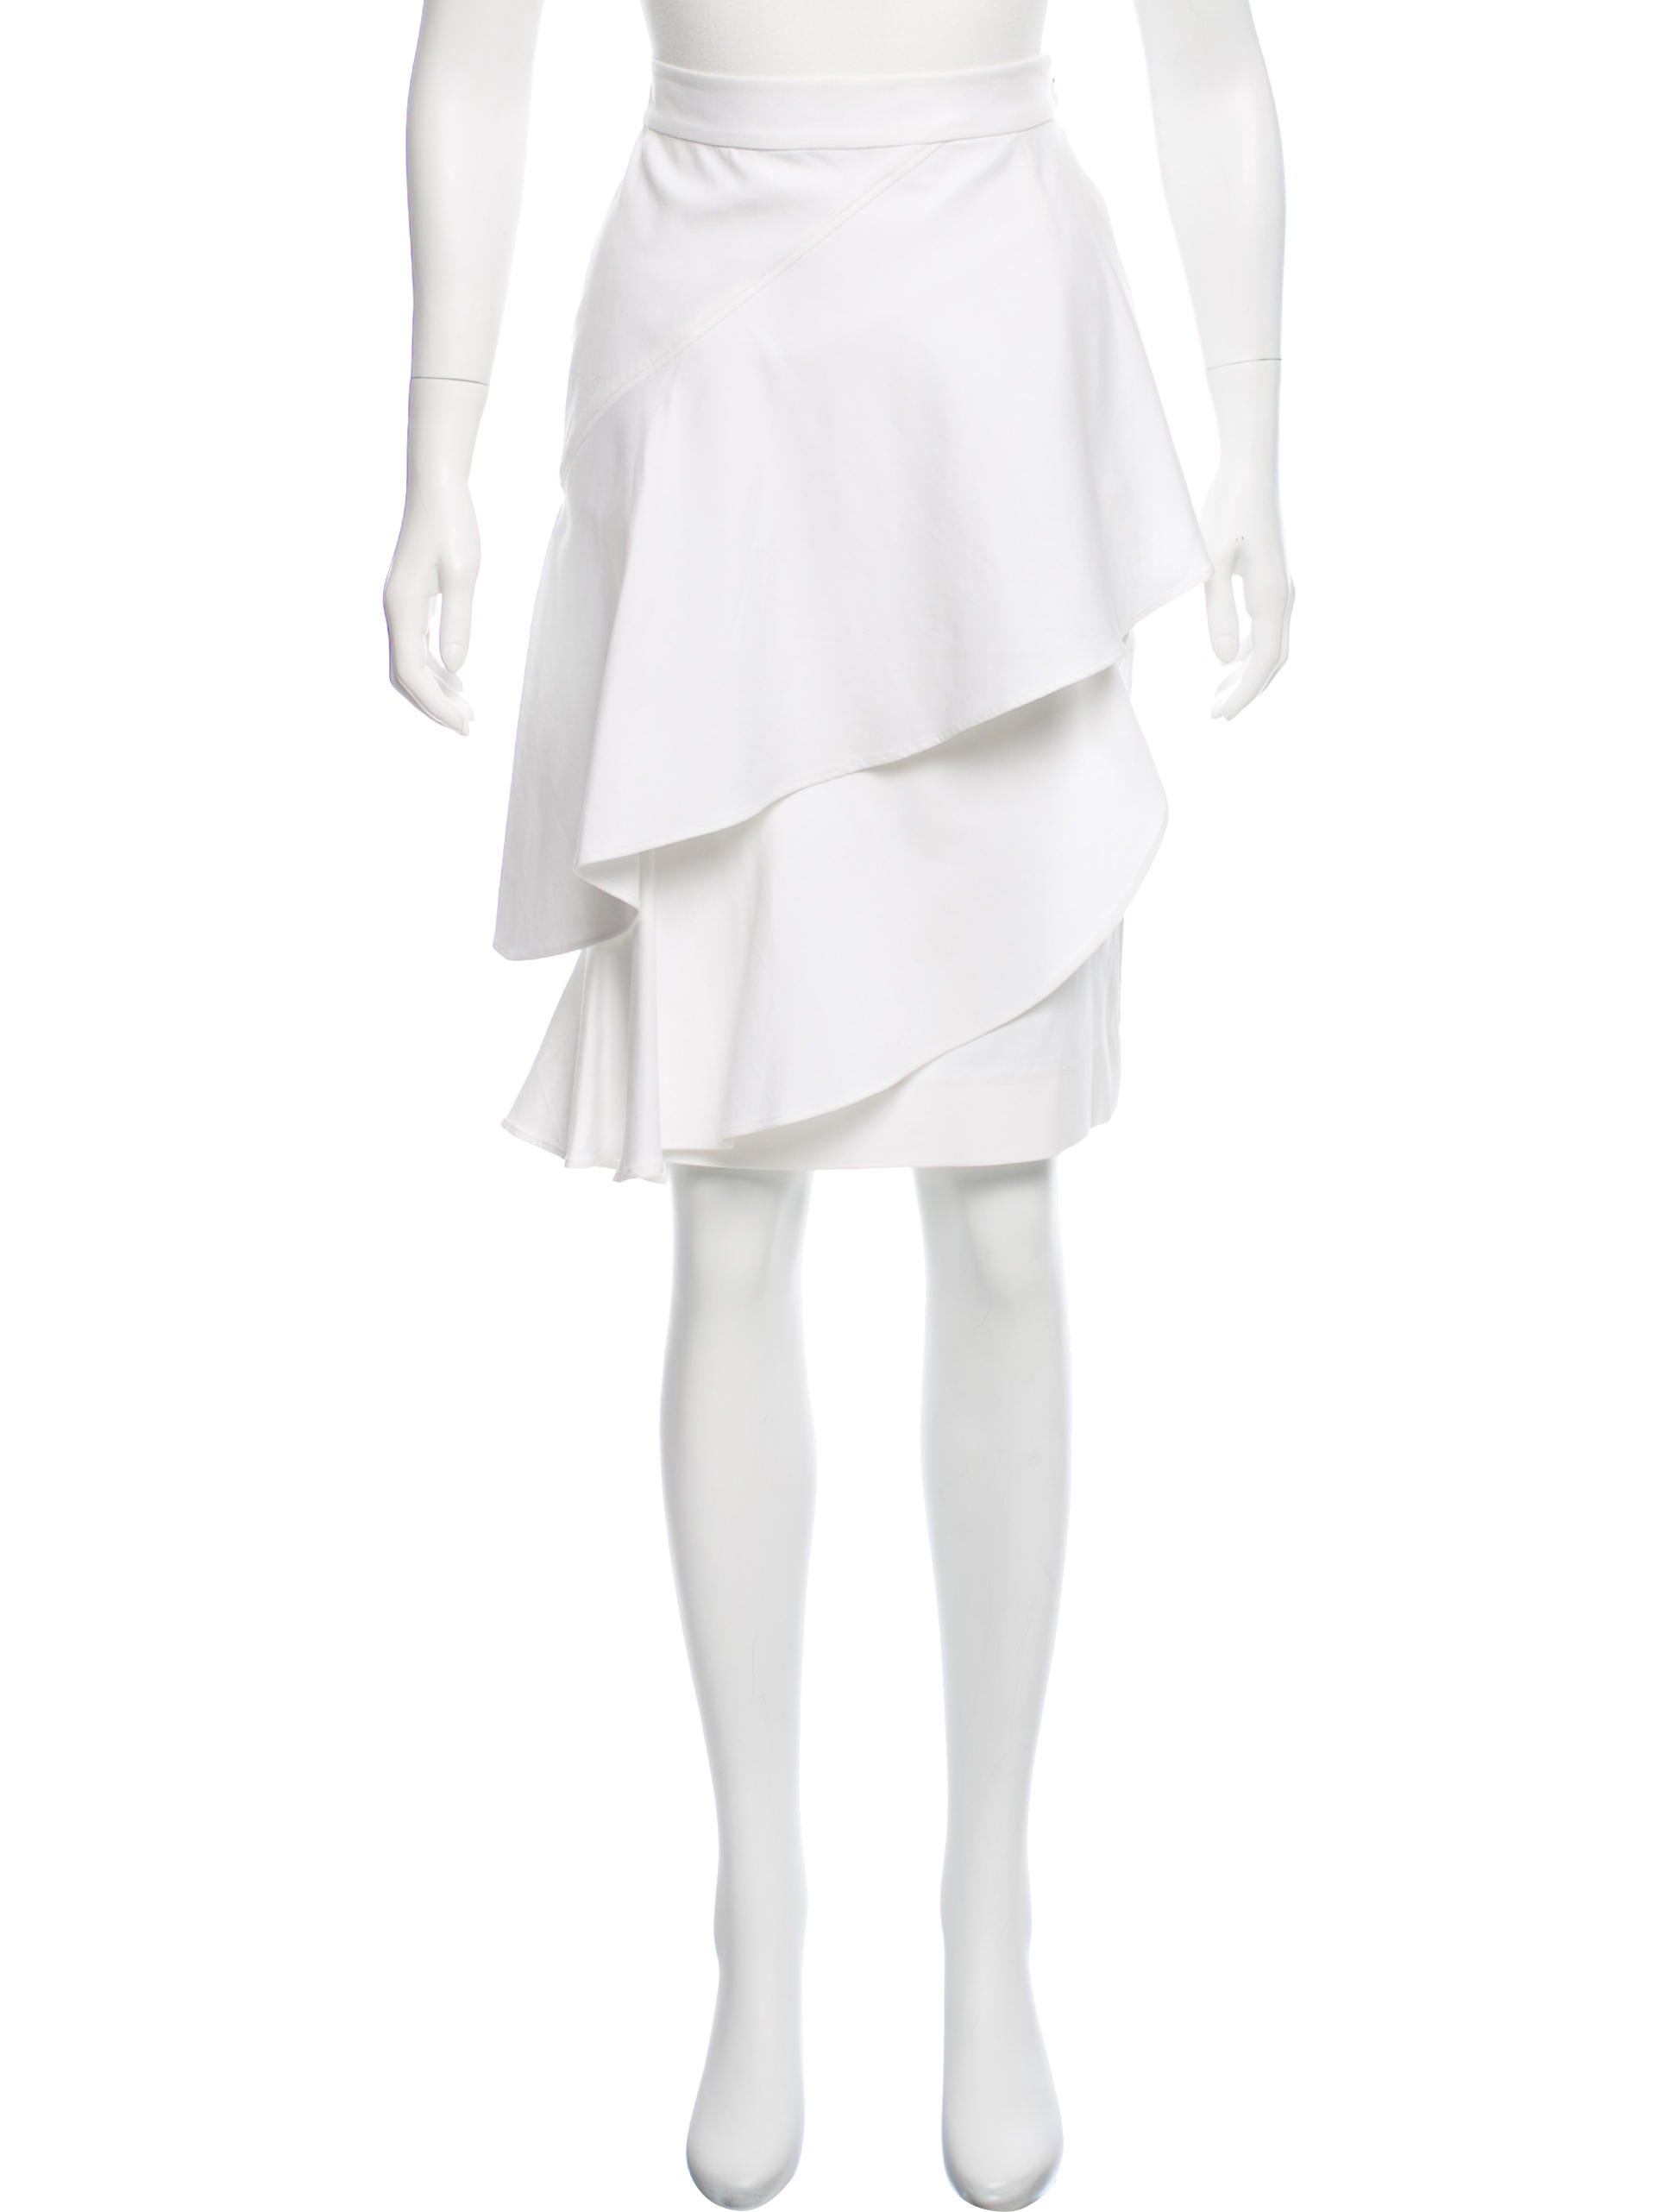 Accented Marissa Ruffle Webb Maw21591 Clothing Skirt Tags Dom W 47wzxn7OUq